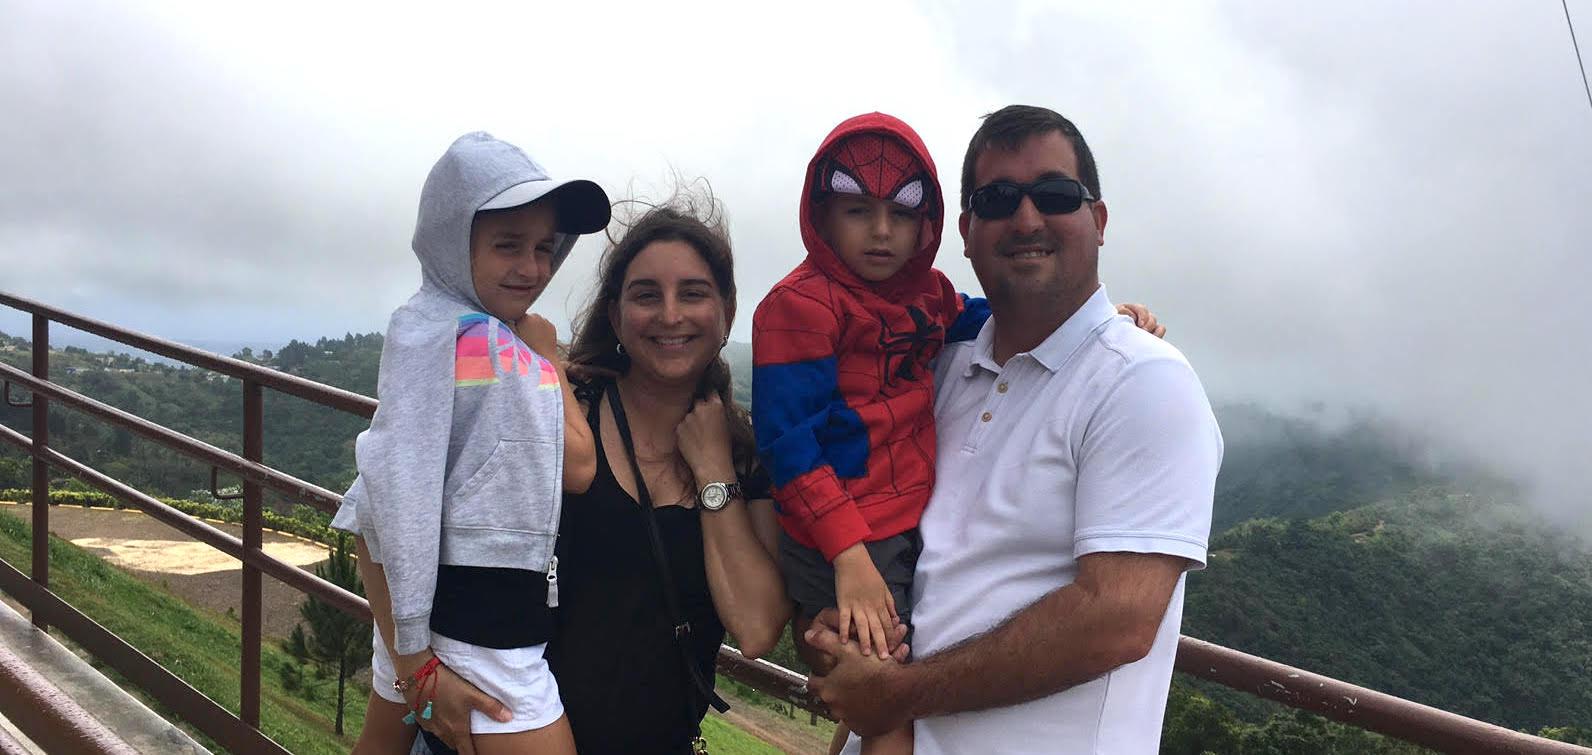 Rebeca Busquets Villegas family scenery